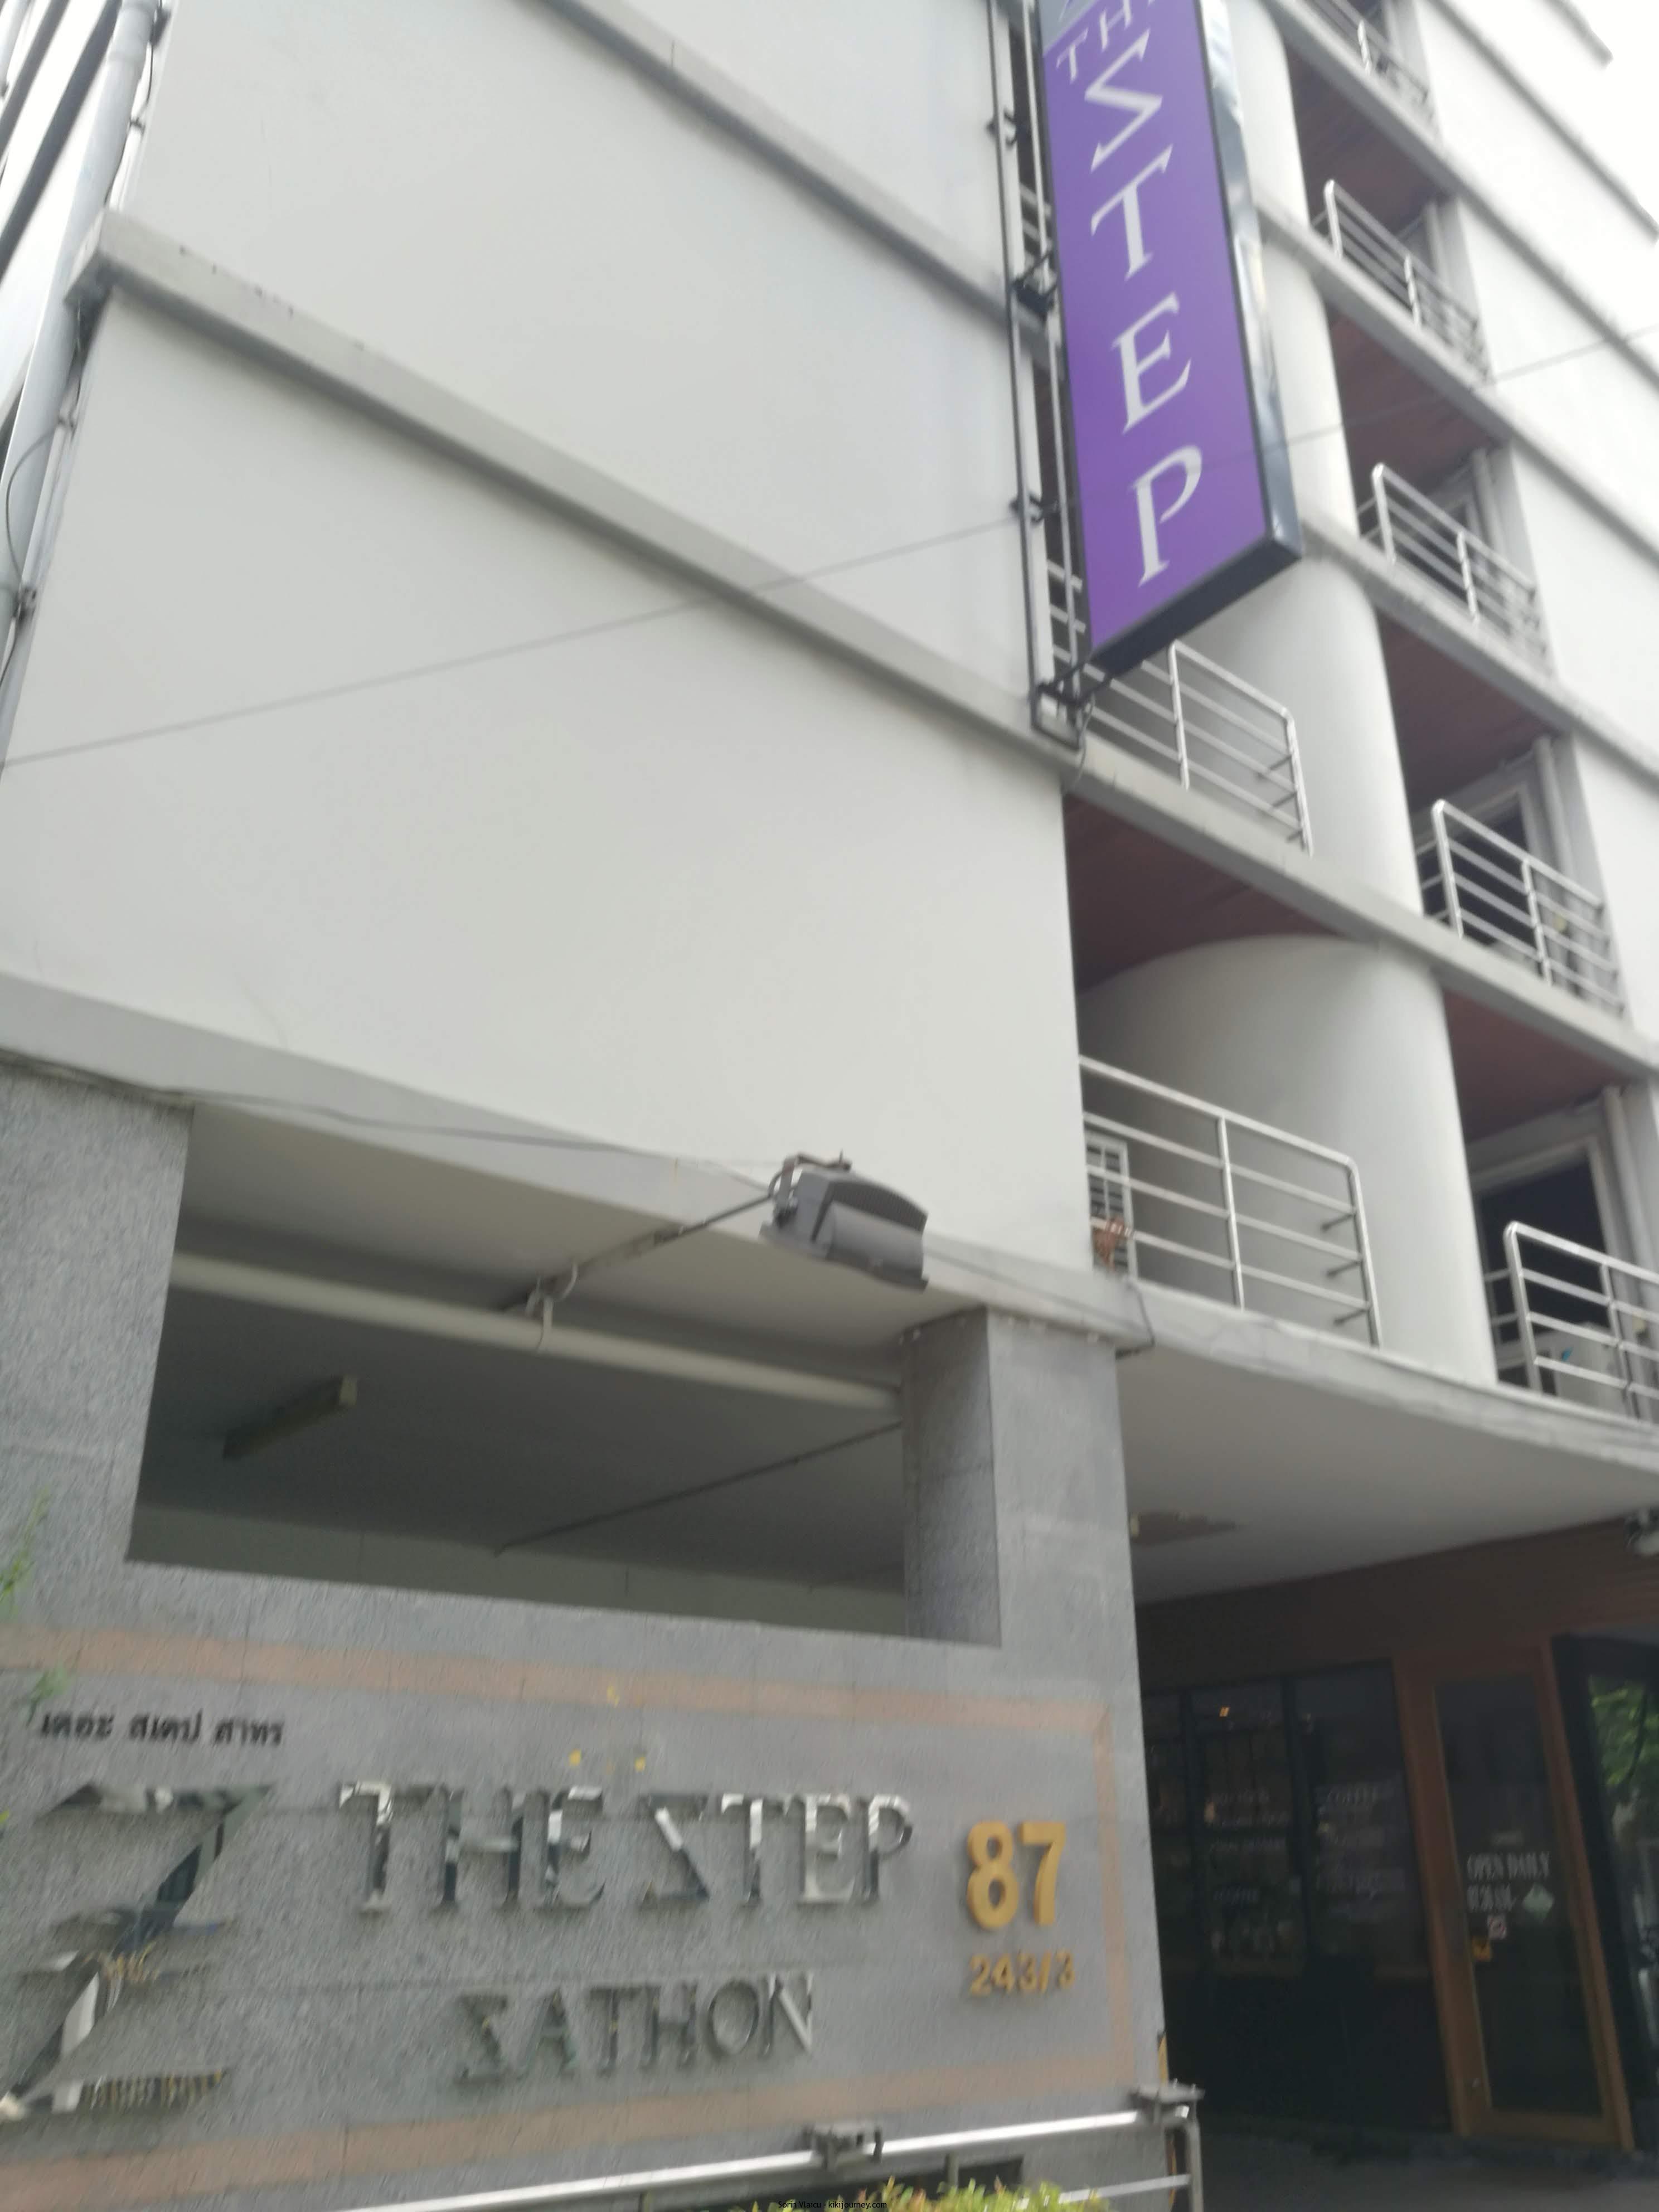 Hotel Review: The Step Sathorn | Bangkok |Thailand